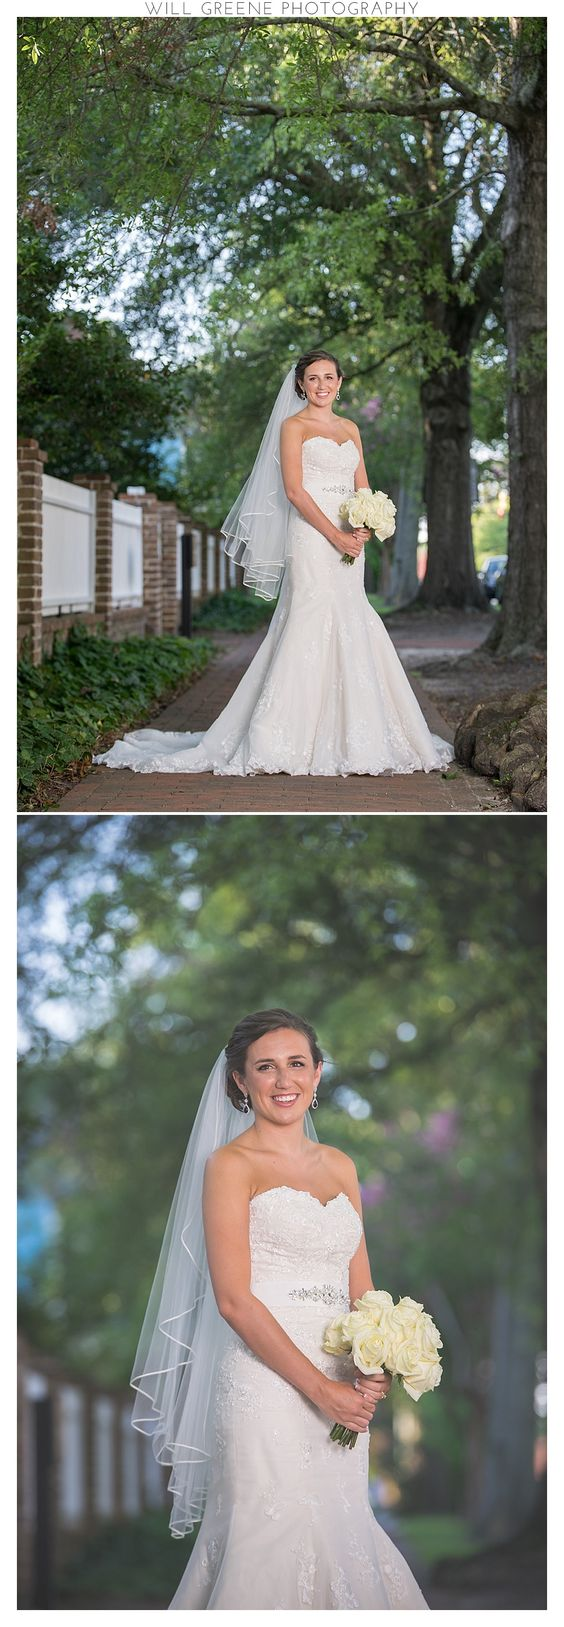 Bridal shoot near Tryon Palace, New Bern NC, Will Greene Photography